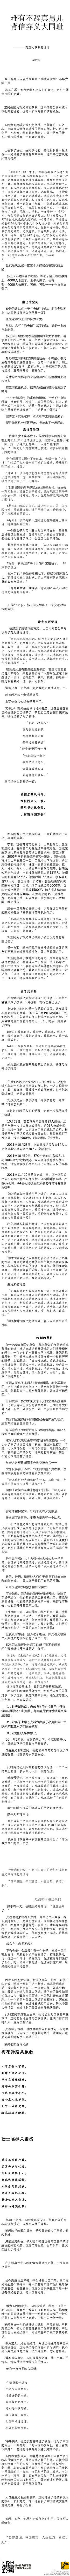 Guo Yushan-memo